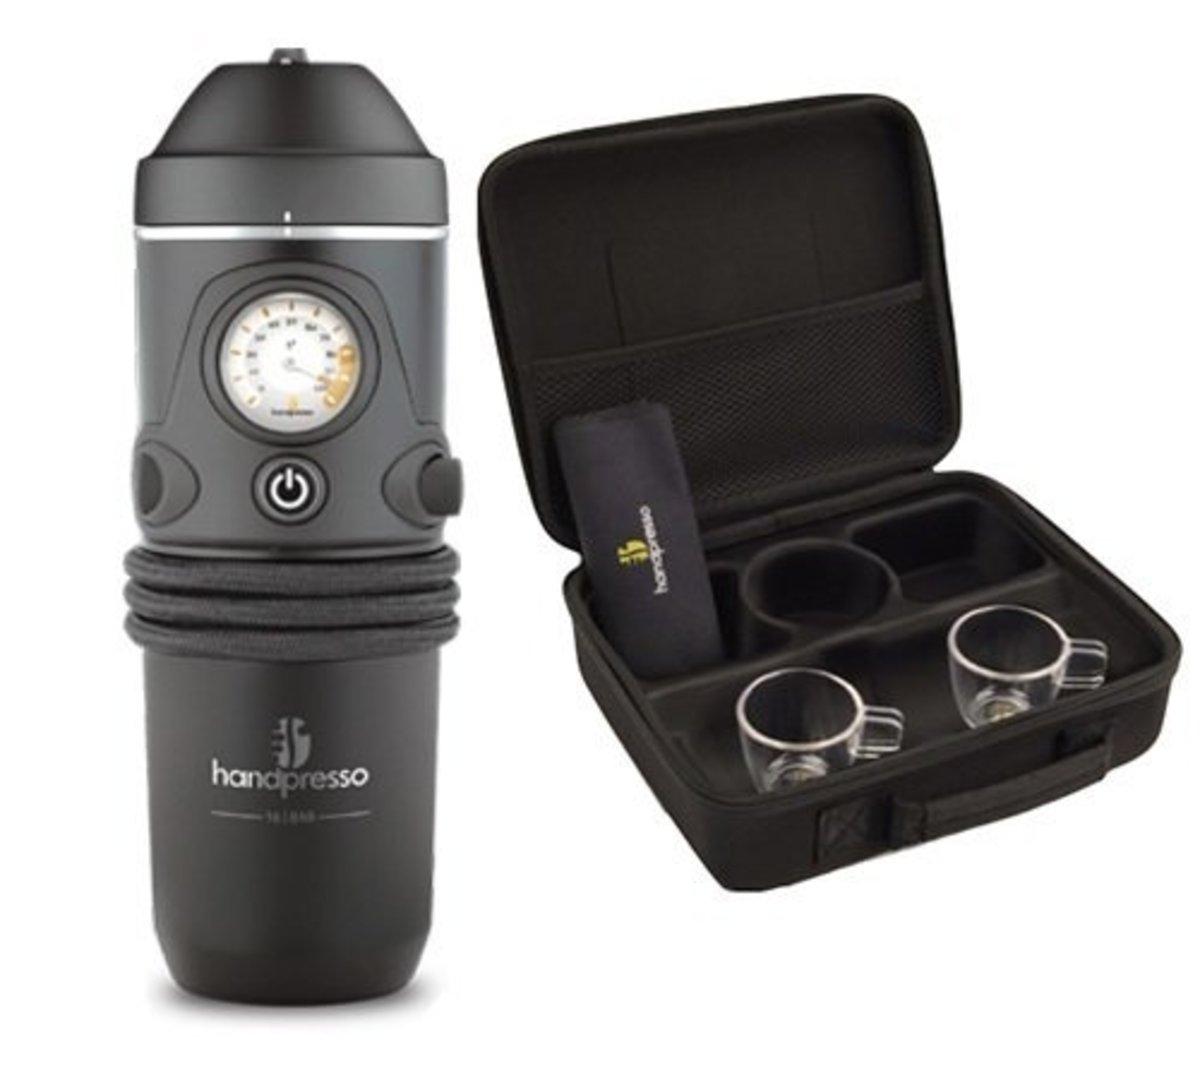 Handpresso Auto: 12v coffee maker for the car